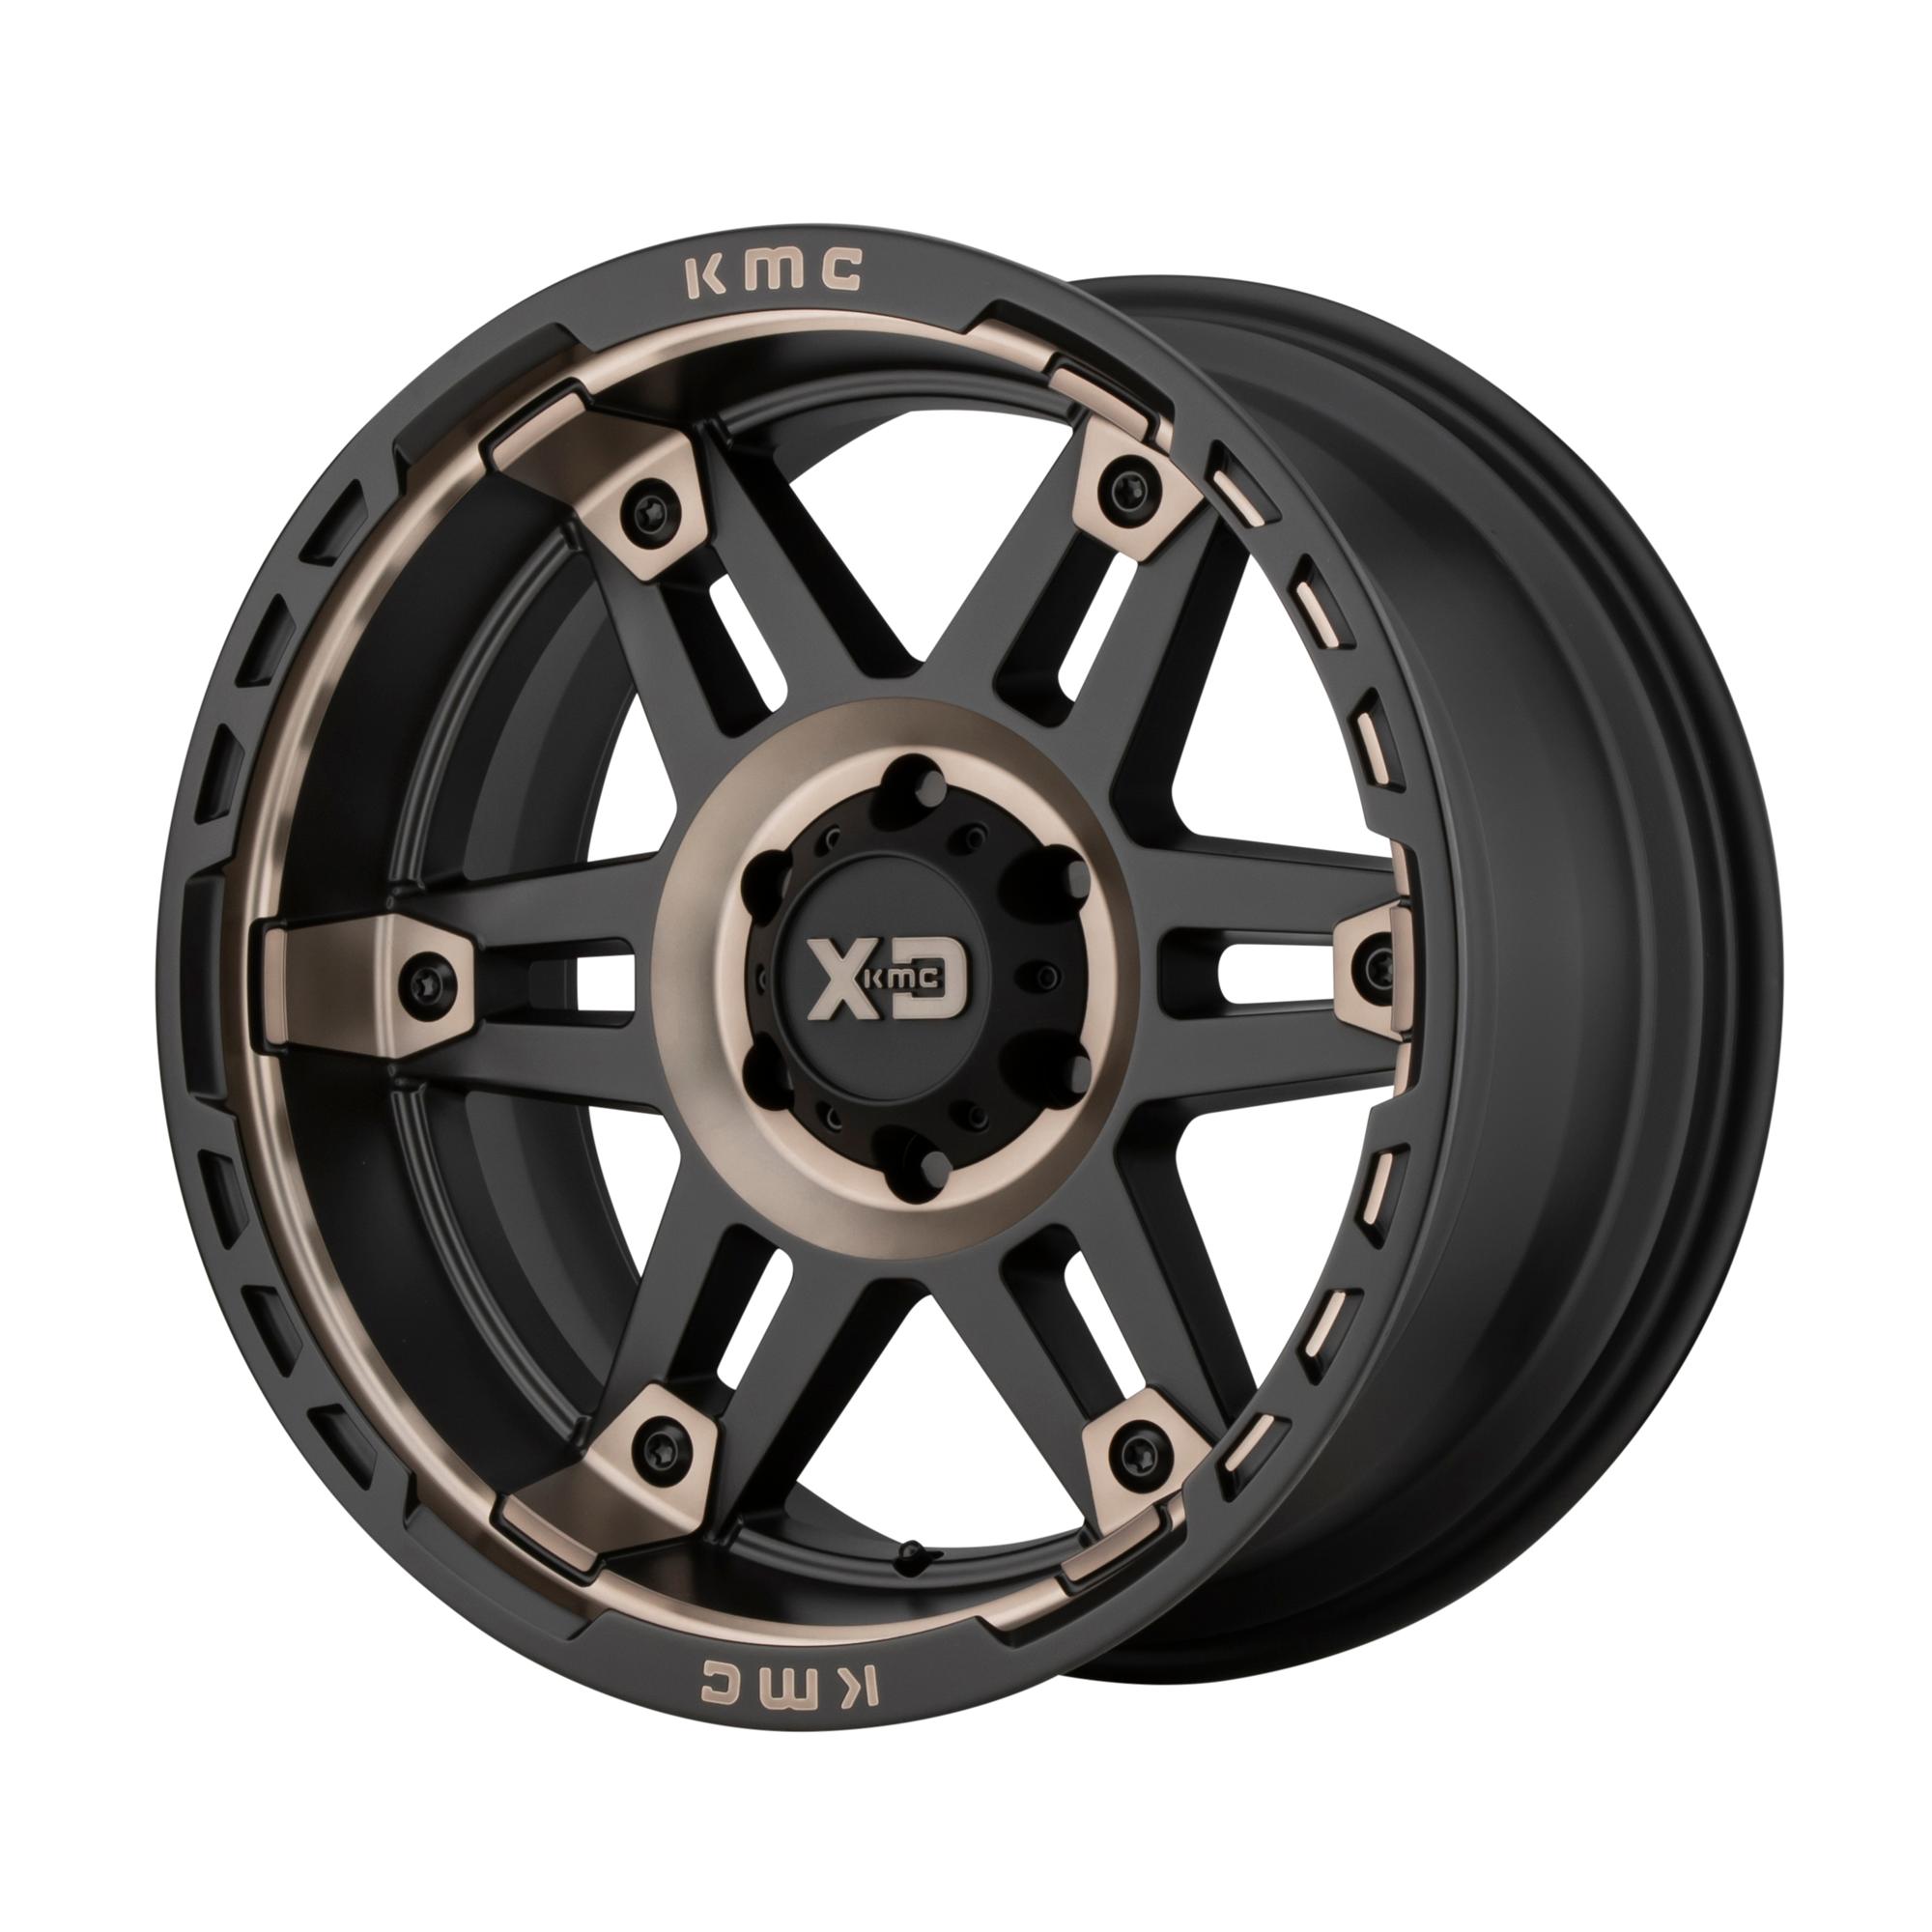 XD SERIES XD840 SPY II hliníkové disky 8x17 6x135 ET18 Satin Black Dark Tint